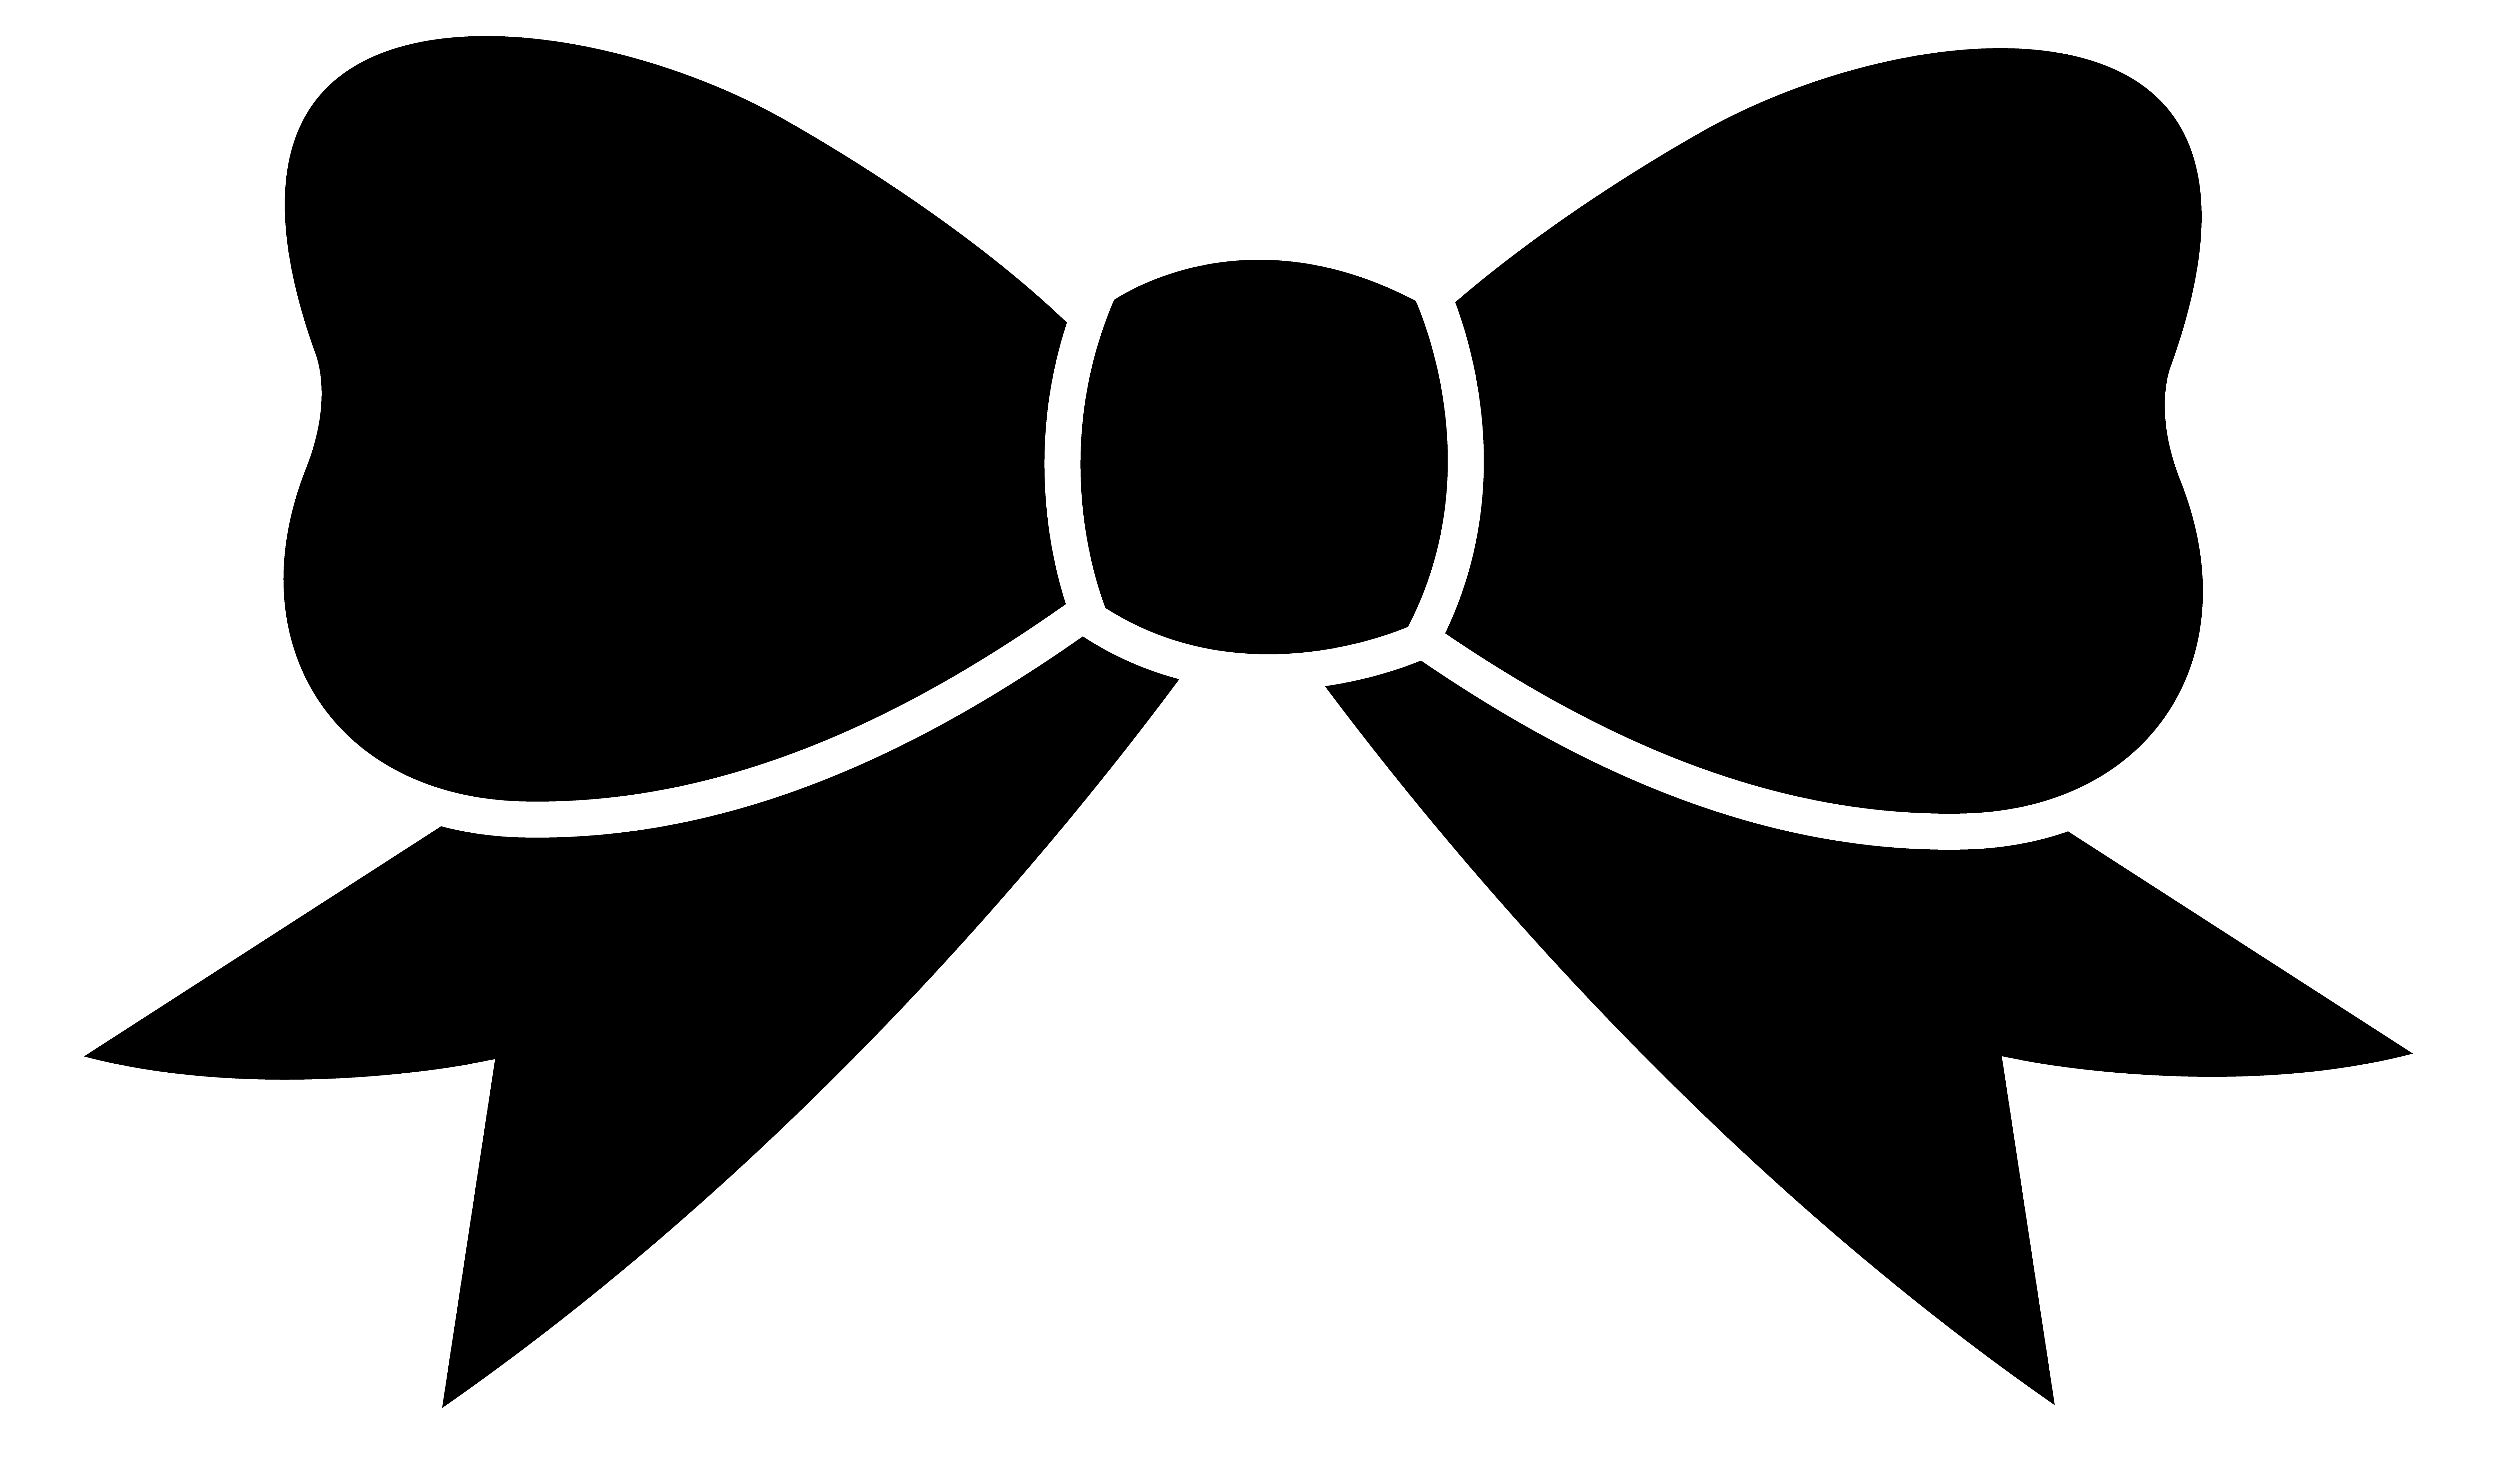 Bows Clipart-Bows Clipart-9